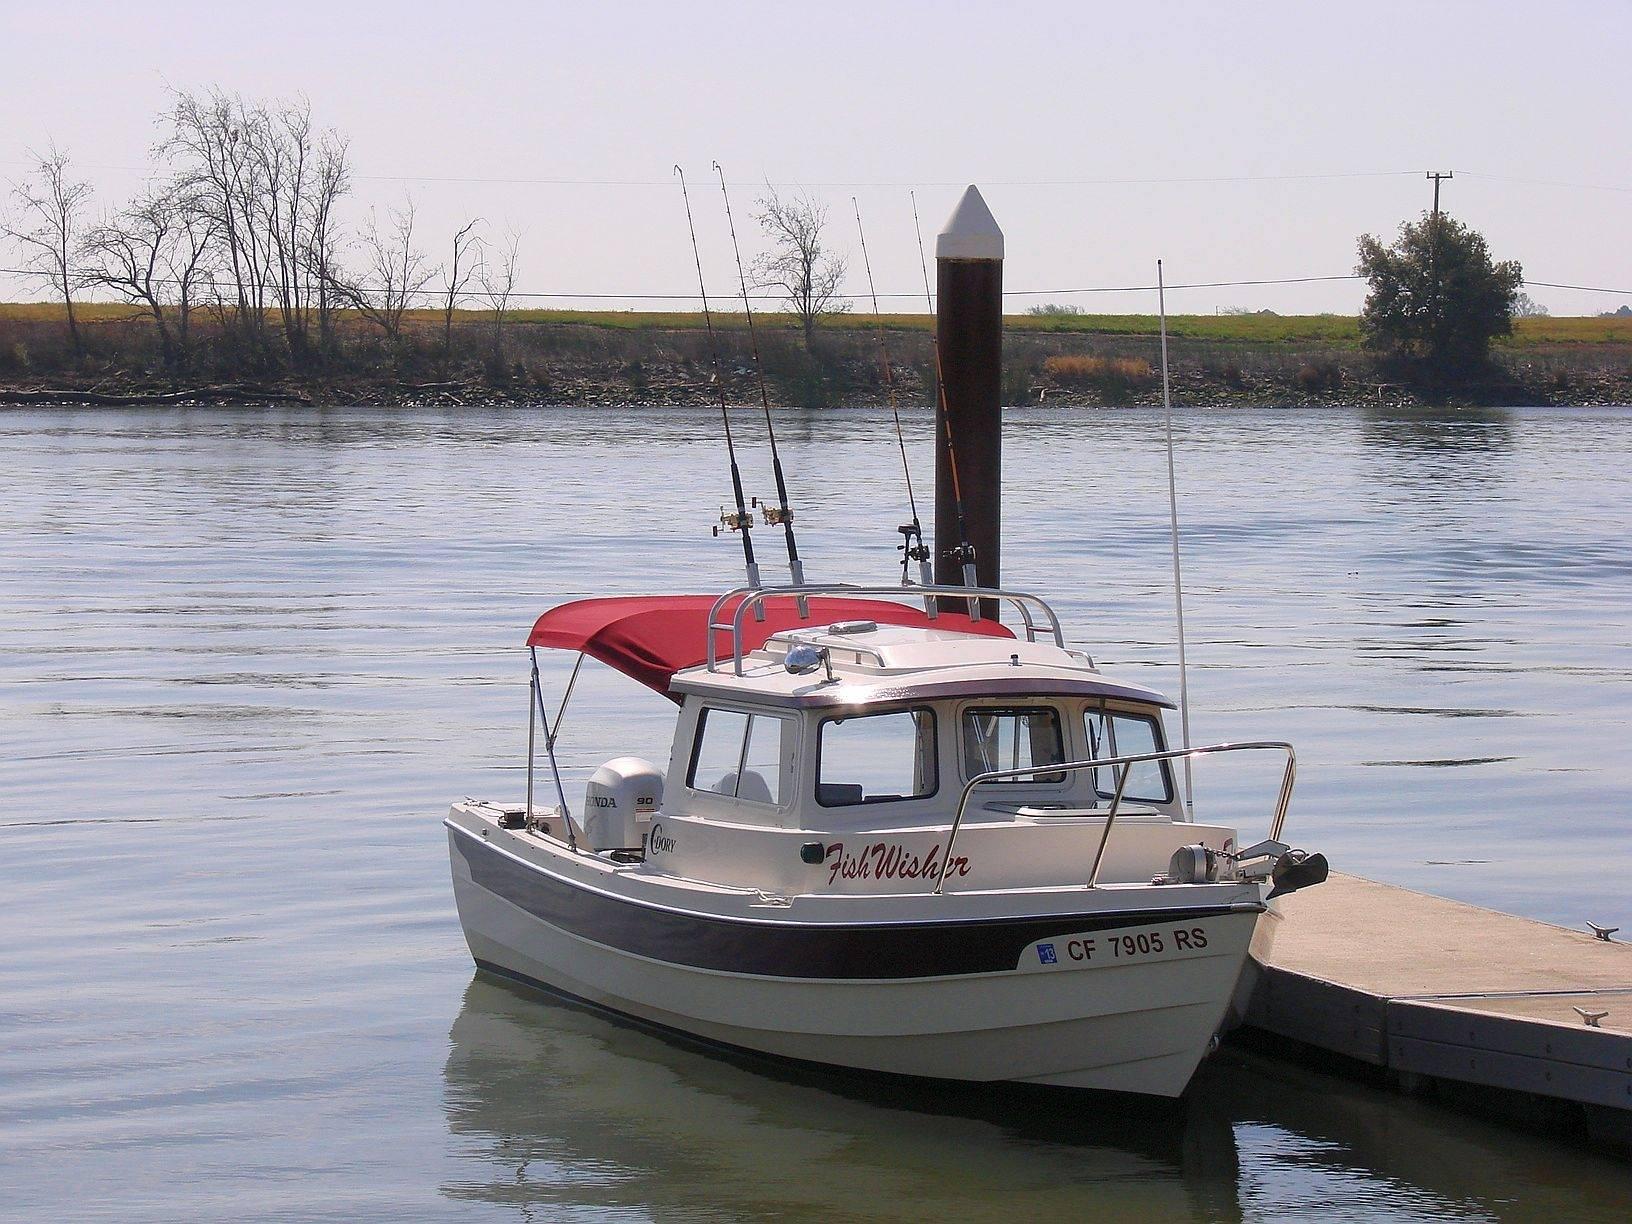 C dory 22 39 angler 2009 for sale bloodydecks for Angler fish for sale